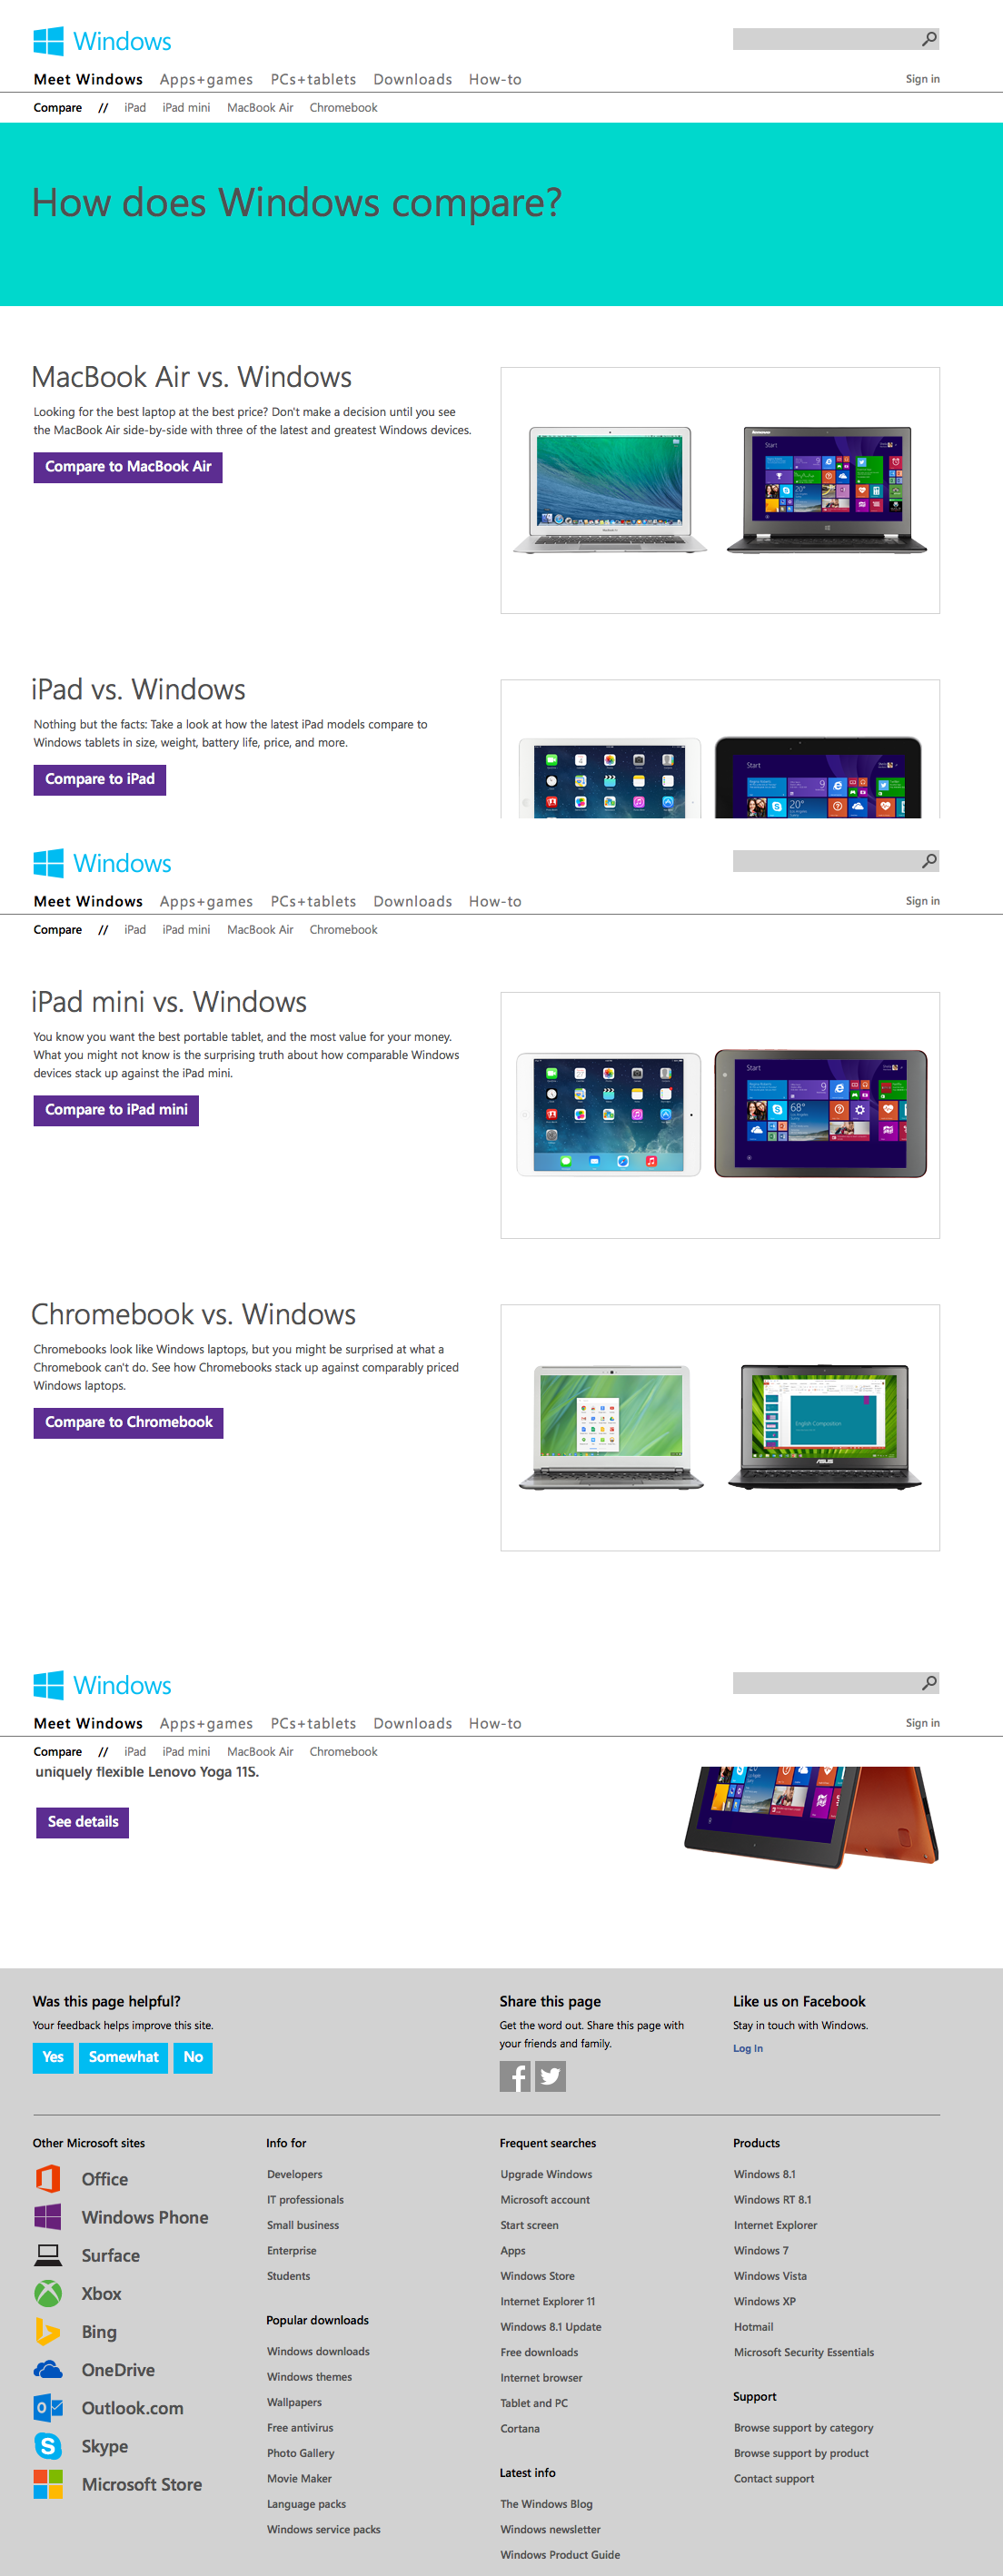 comparatie-windows-macbook-ipda-chromebook